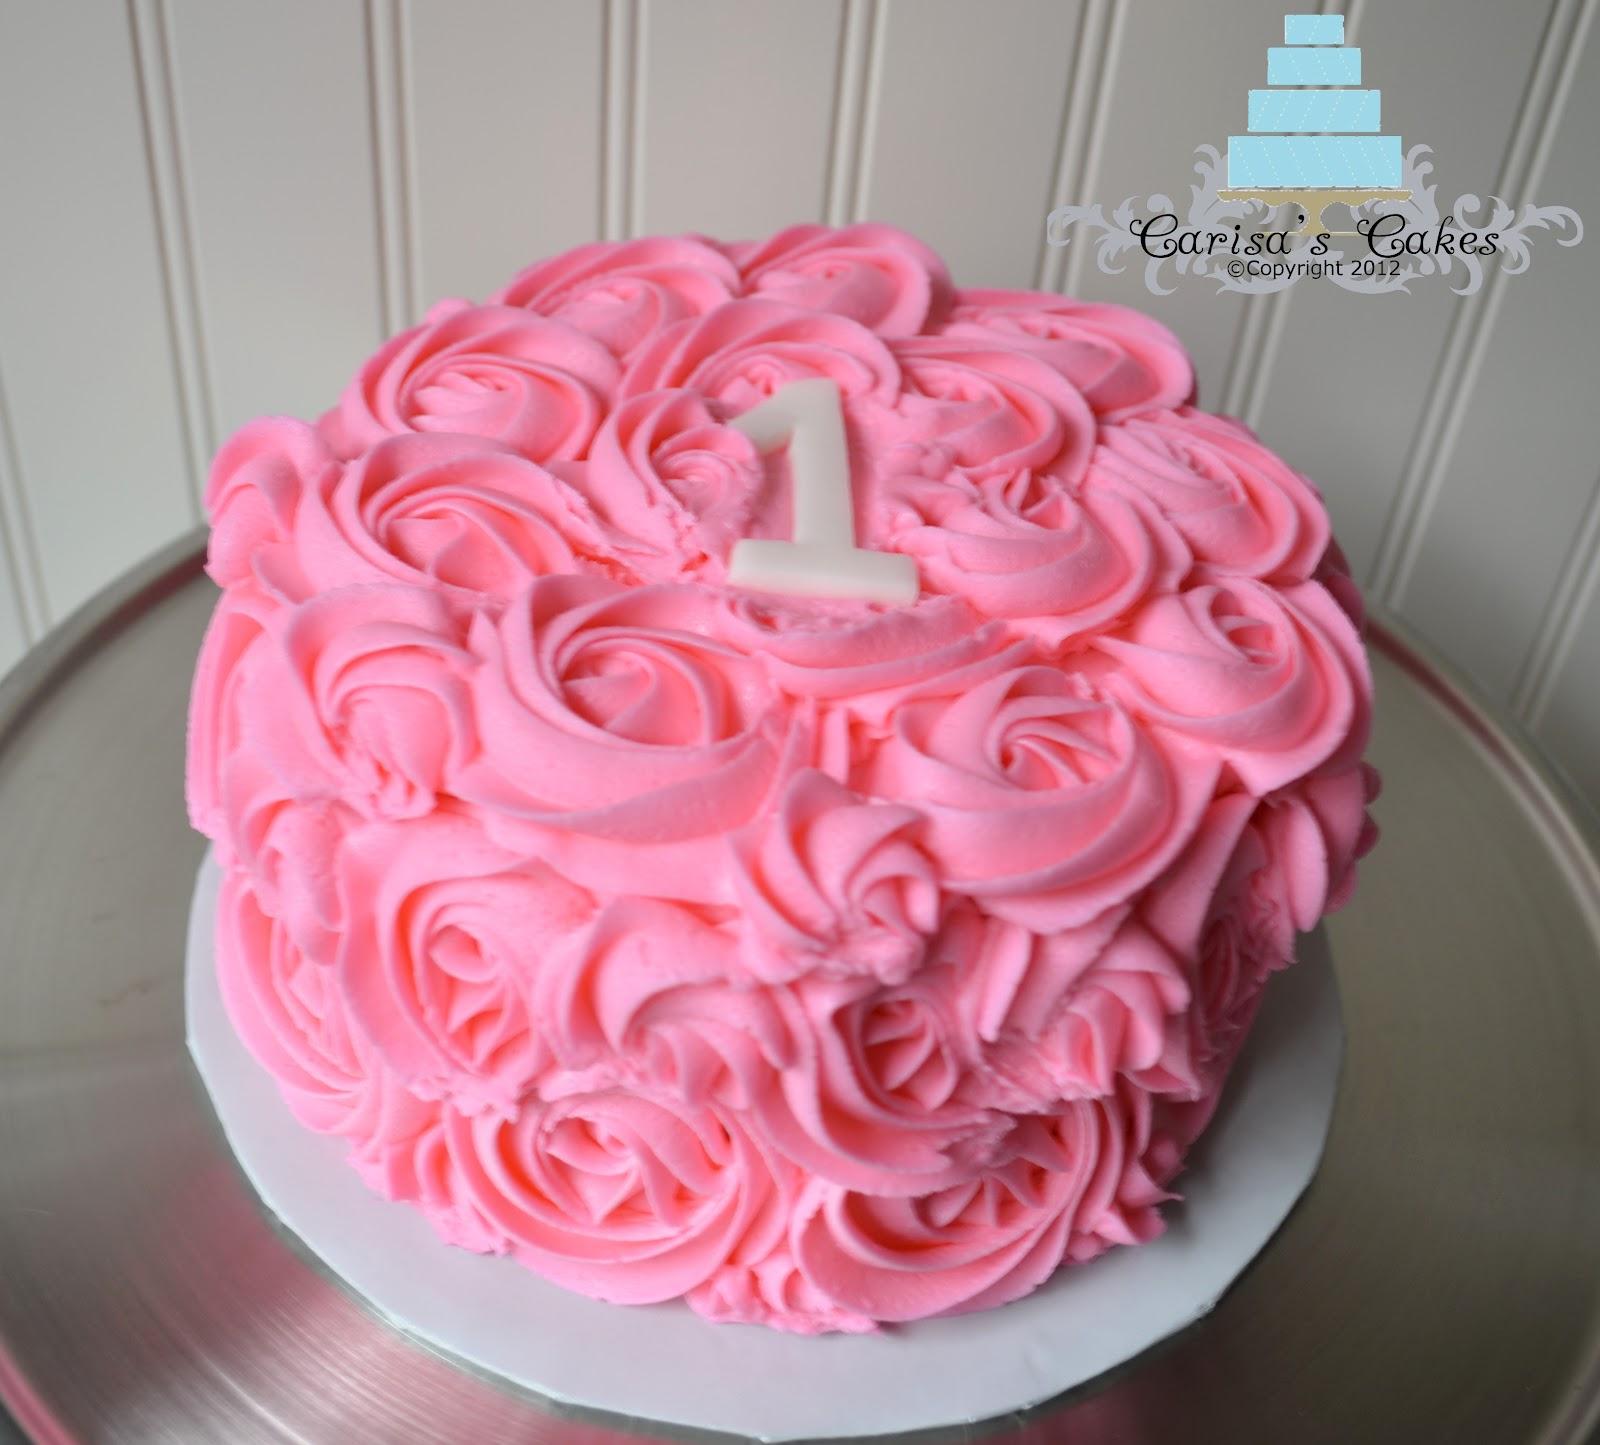 Carisa s Cakes: Rose Swirl Smash Cake #3